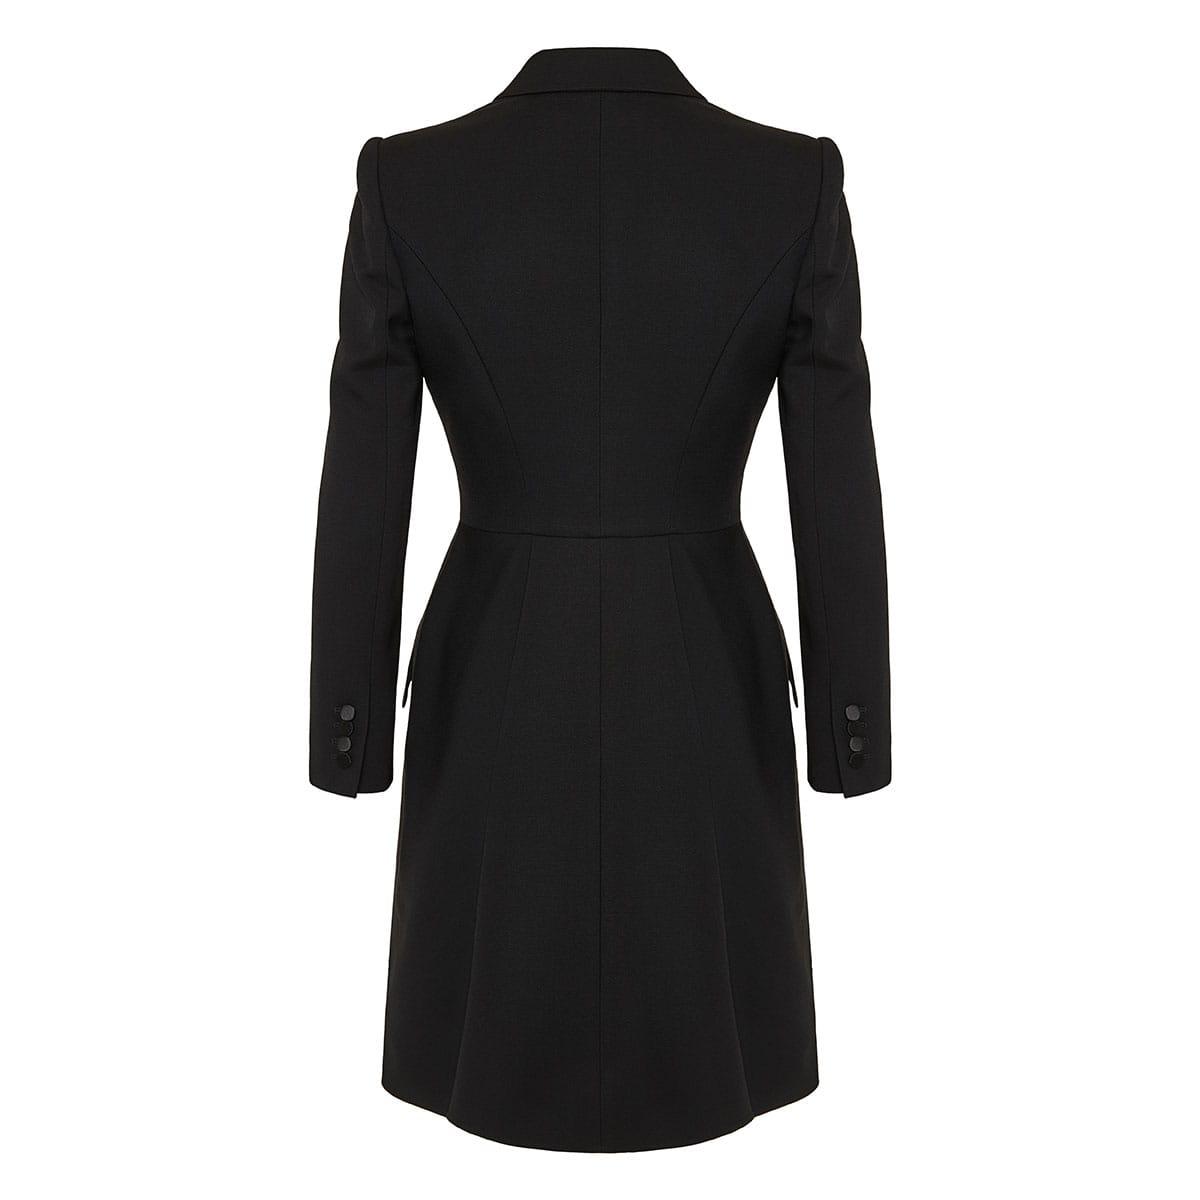 Satin-trimmed blazer dress